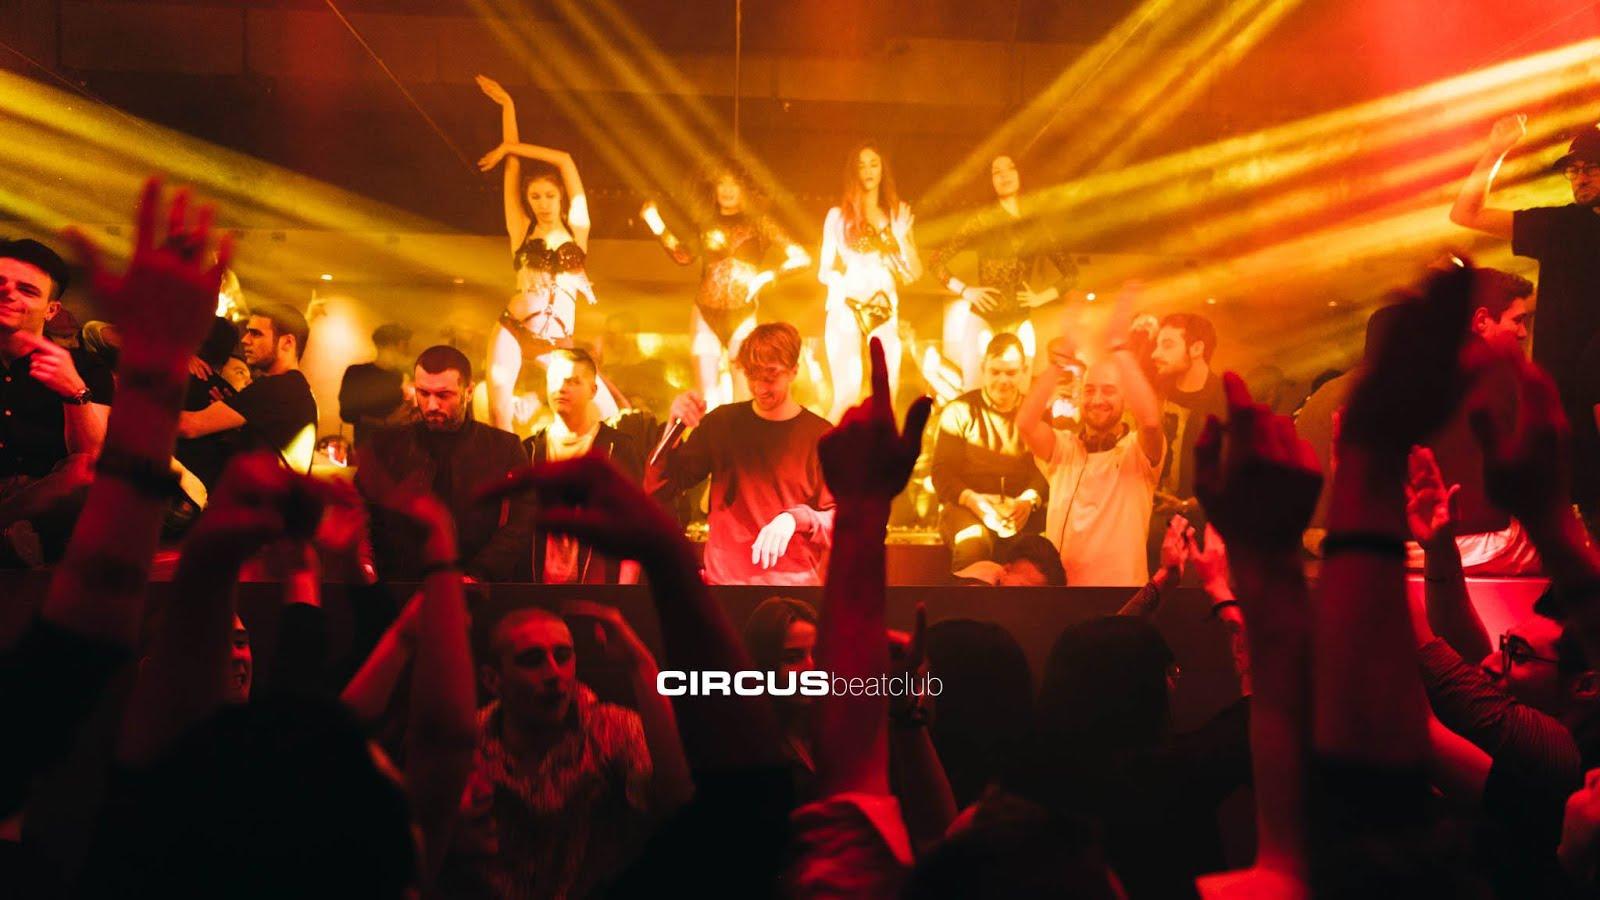 Circus beatclub - Brescia: a dicembre, Aperti per Ferie con Rehab, Vida Loca, Samuele Sartini, Rudeejay, Luca Guerrieri